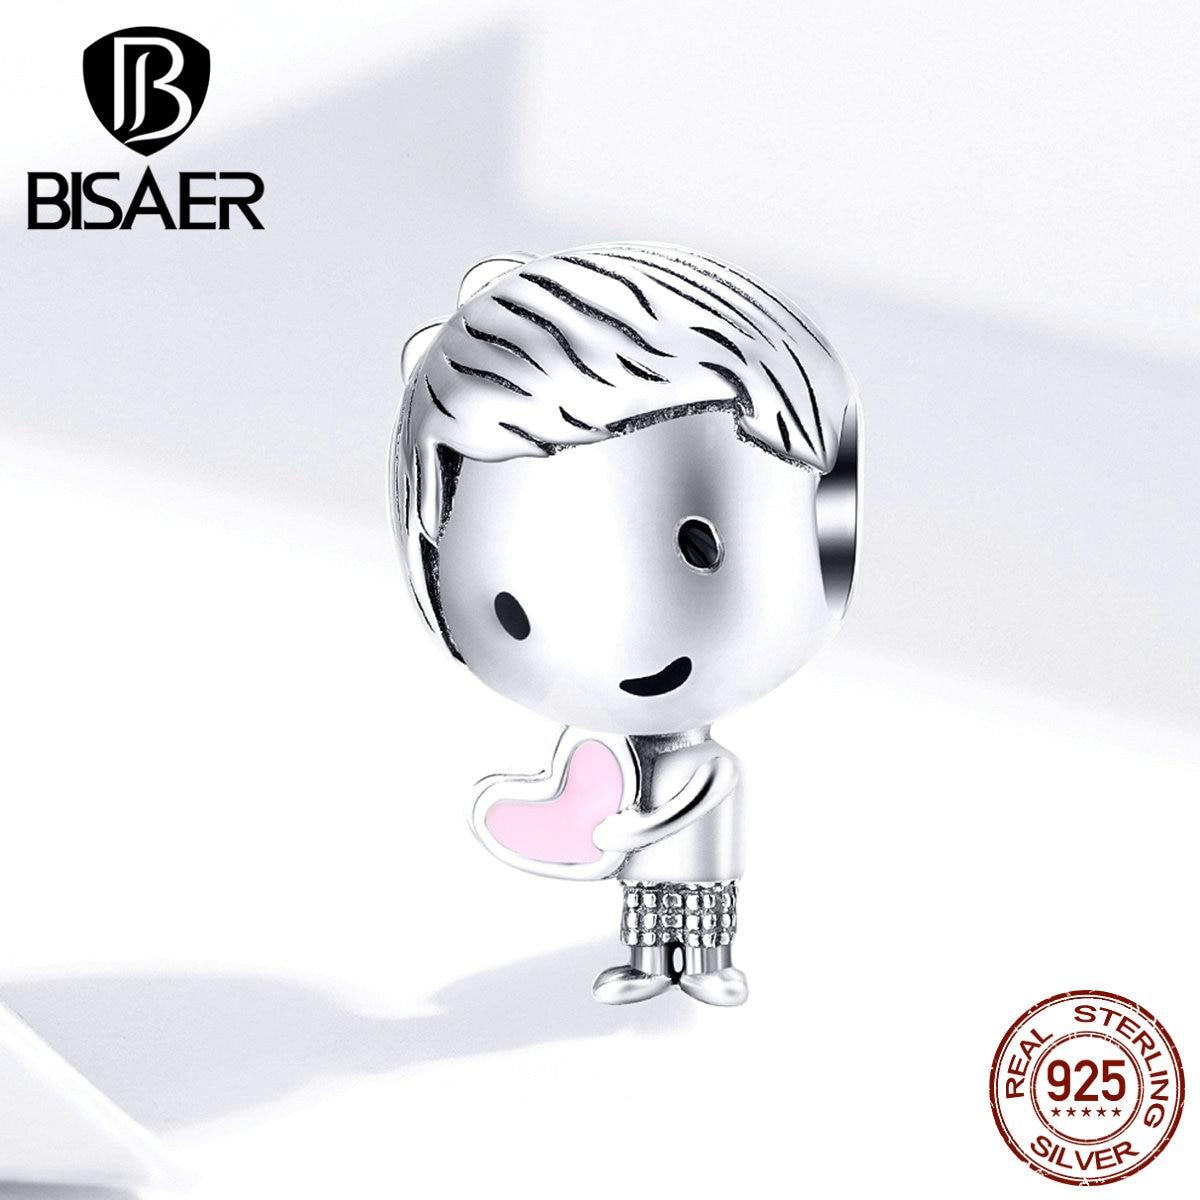 Little Boy BISAER 925 Sterling Silver Little Boys Beads Charms Fit Children Girls Bracelets Silver 925 Jewelry ECC1334